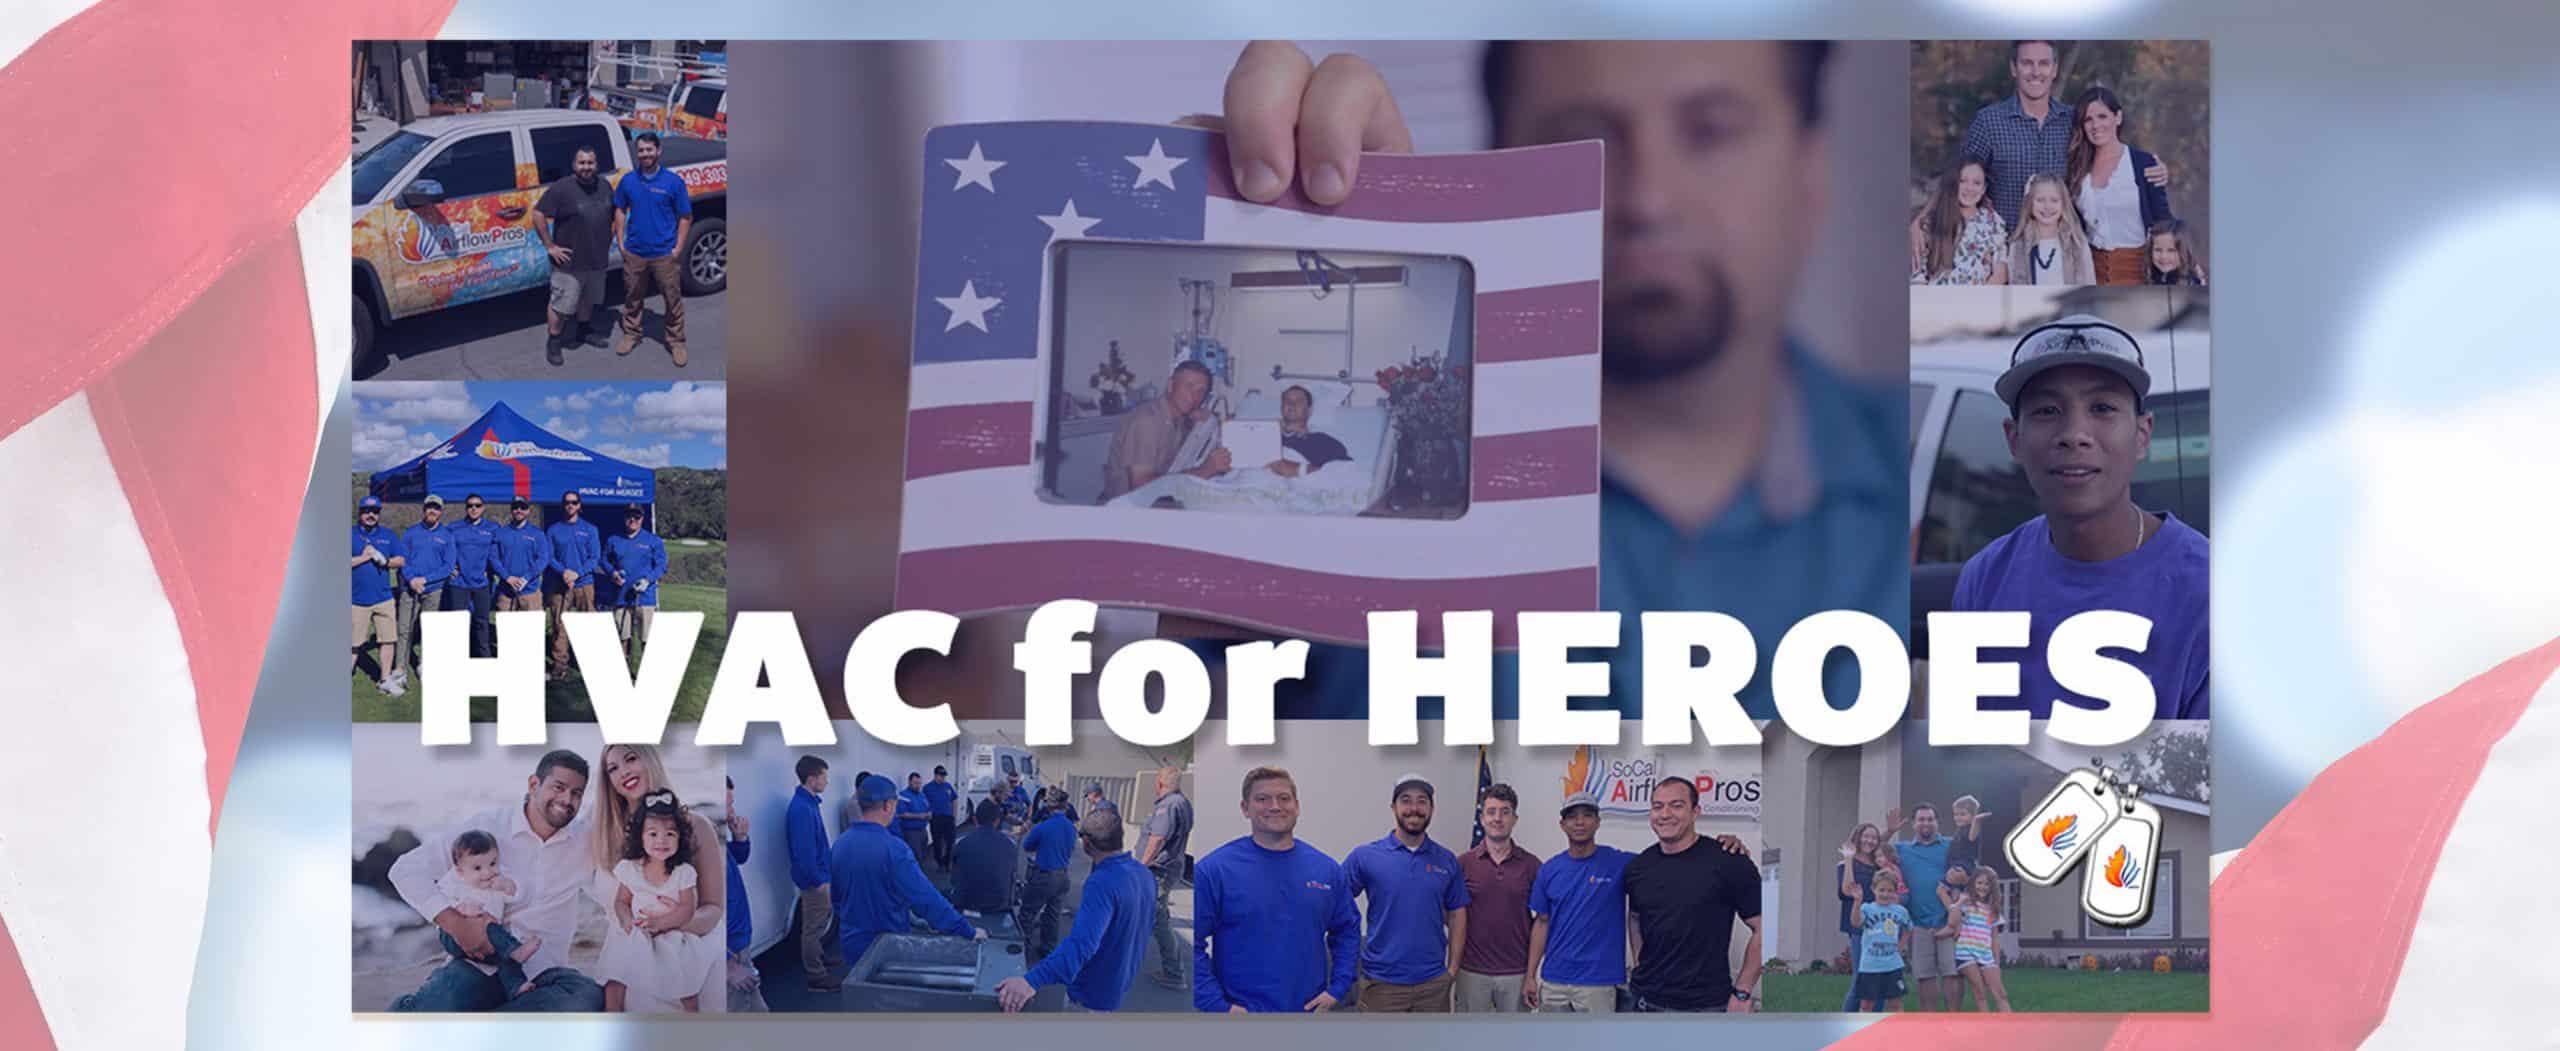 HVAC for HEROES banner